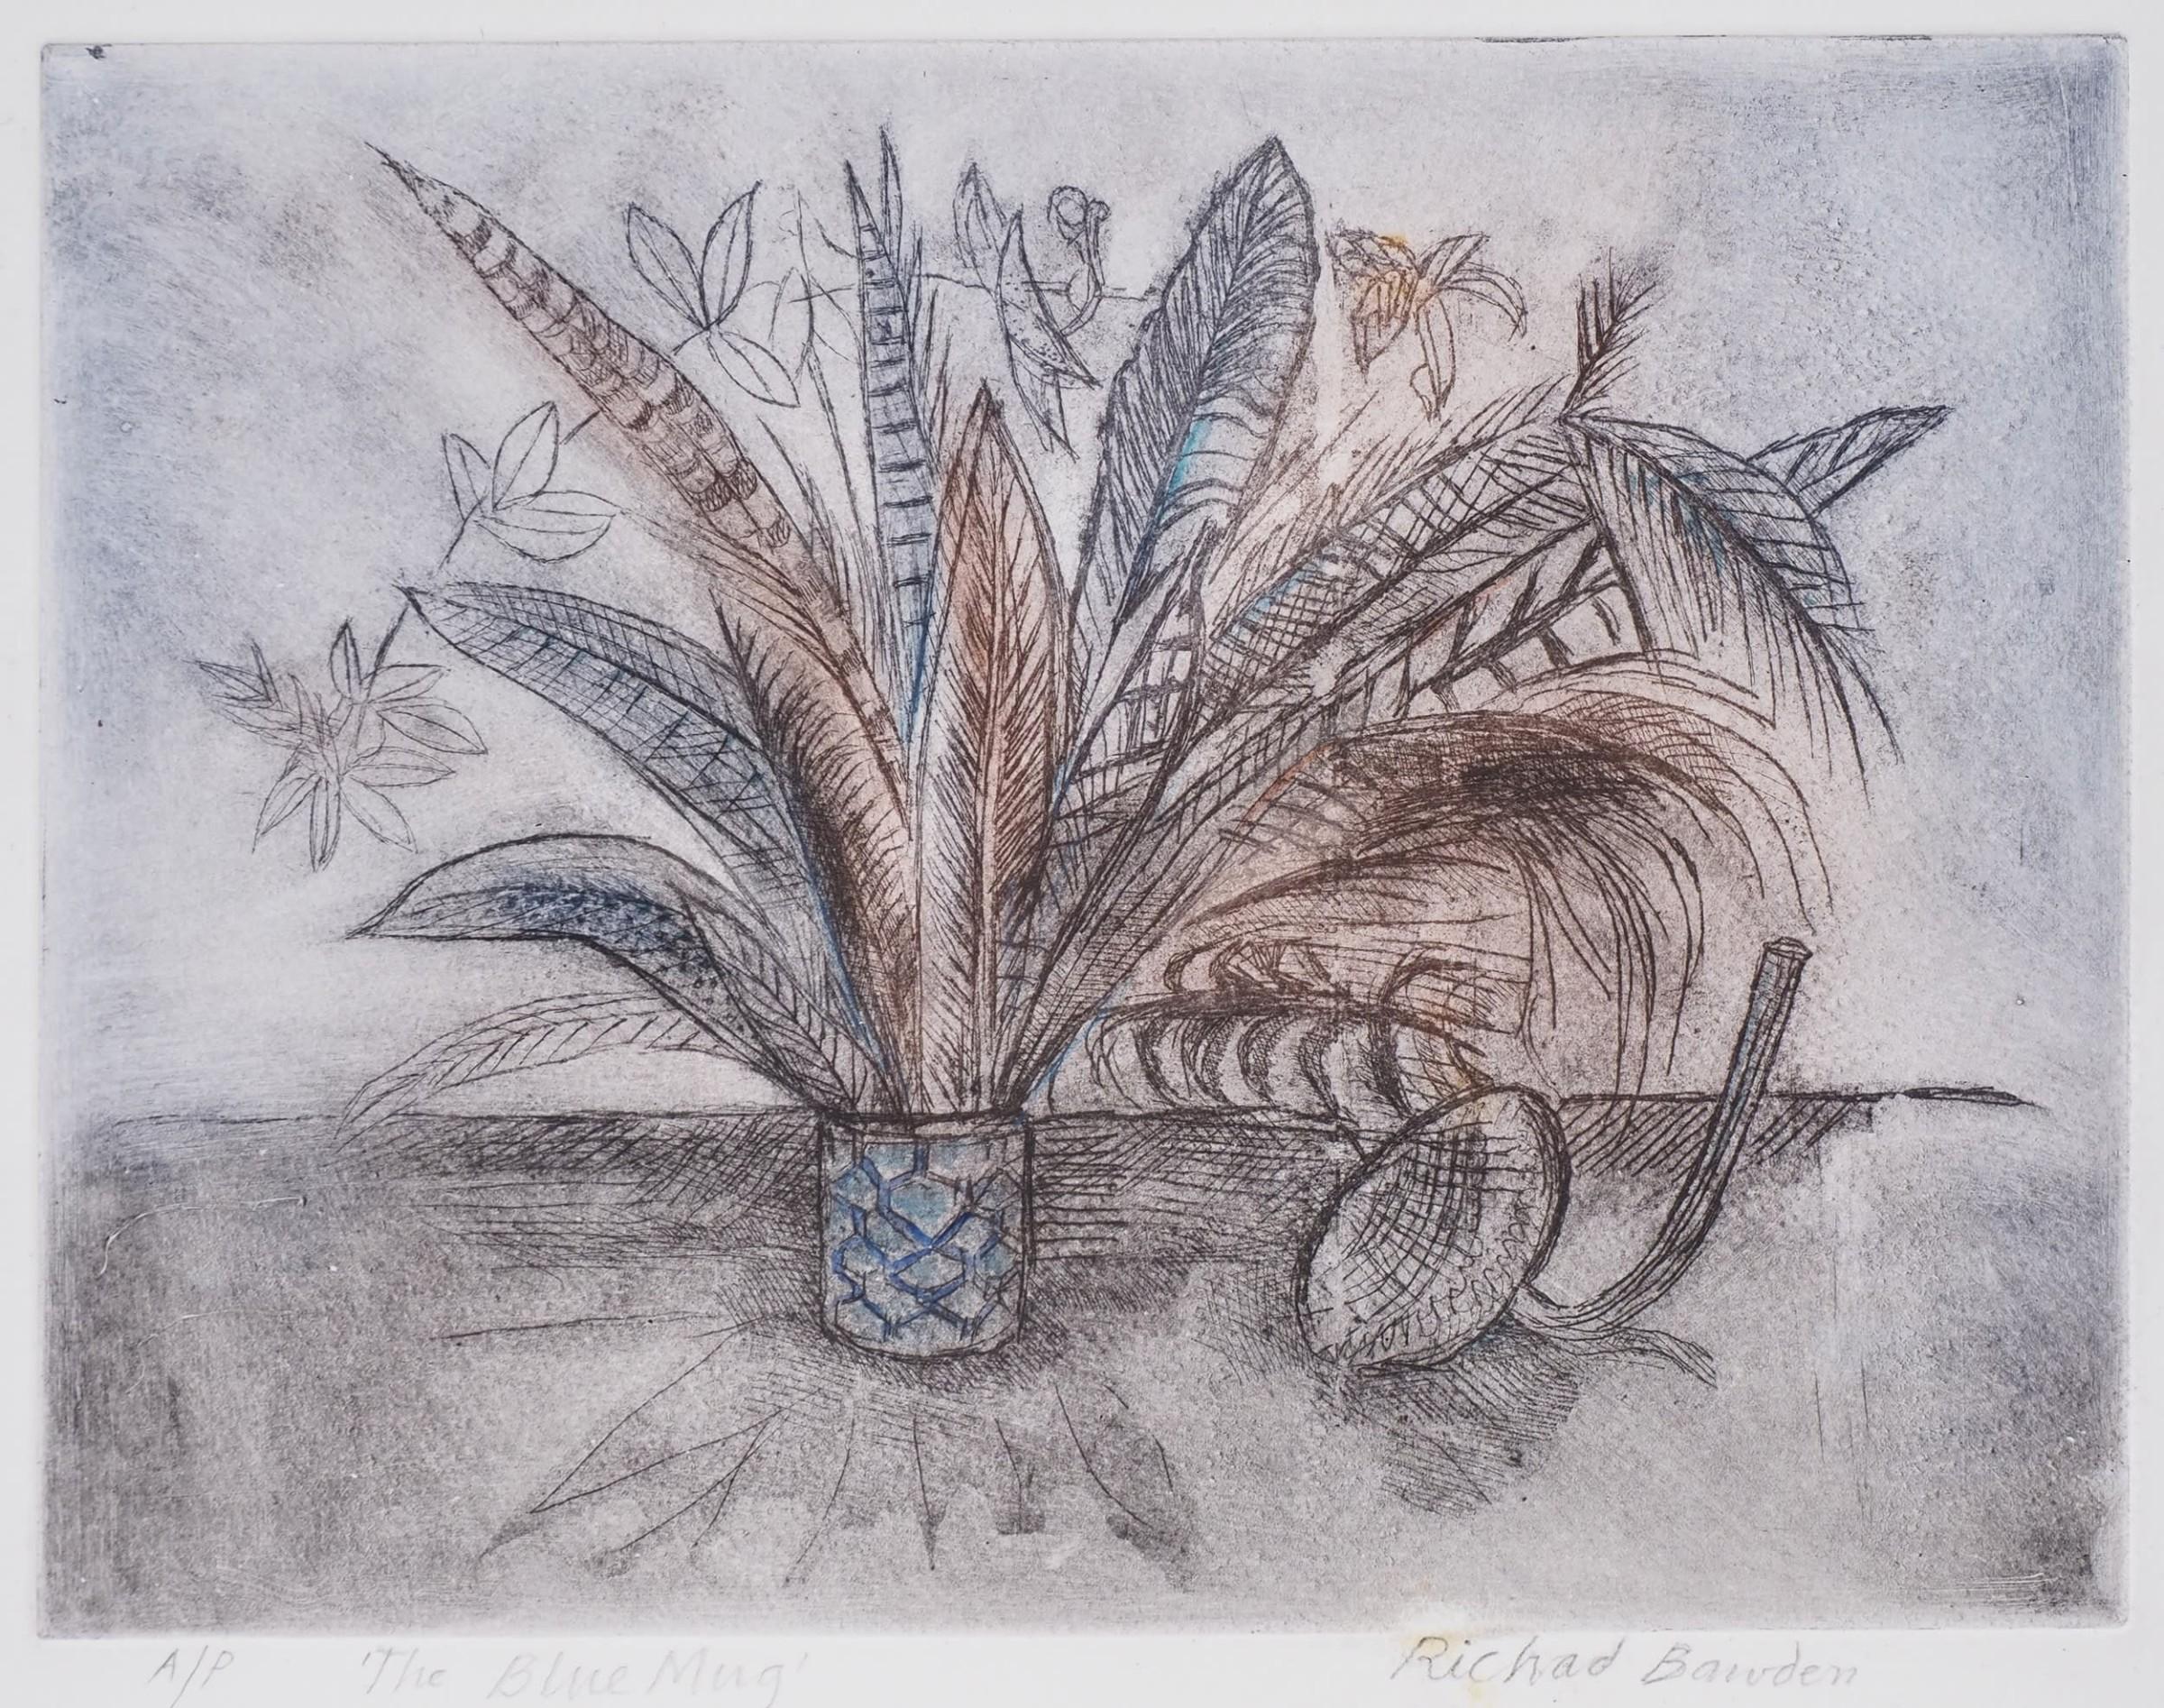 "<span class=""link fancybox-details-link""><a href=""/exhibitions/24/works/artworks_standalone11408/"">View Detail Page</a></span><div class=""artist""><span class=""artist""><strong>Richard Bawden RWS RE</strong></span></div><div class=""title""><em>The Blue Mug</em></div><div class=""medium"">etching</div><div class=""dimensions"">40 x 45 cm framed<br>25 x 33 cm image size</div>"